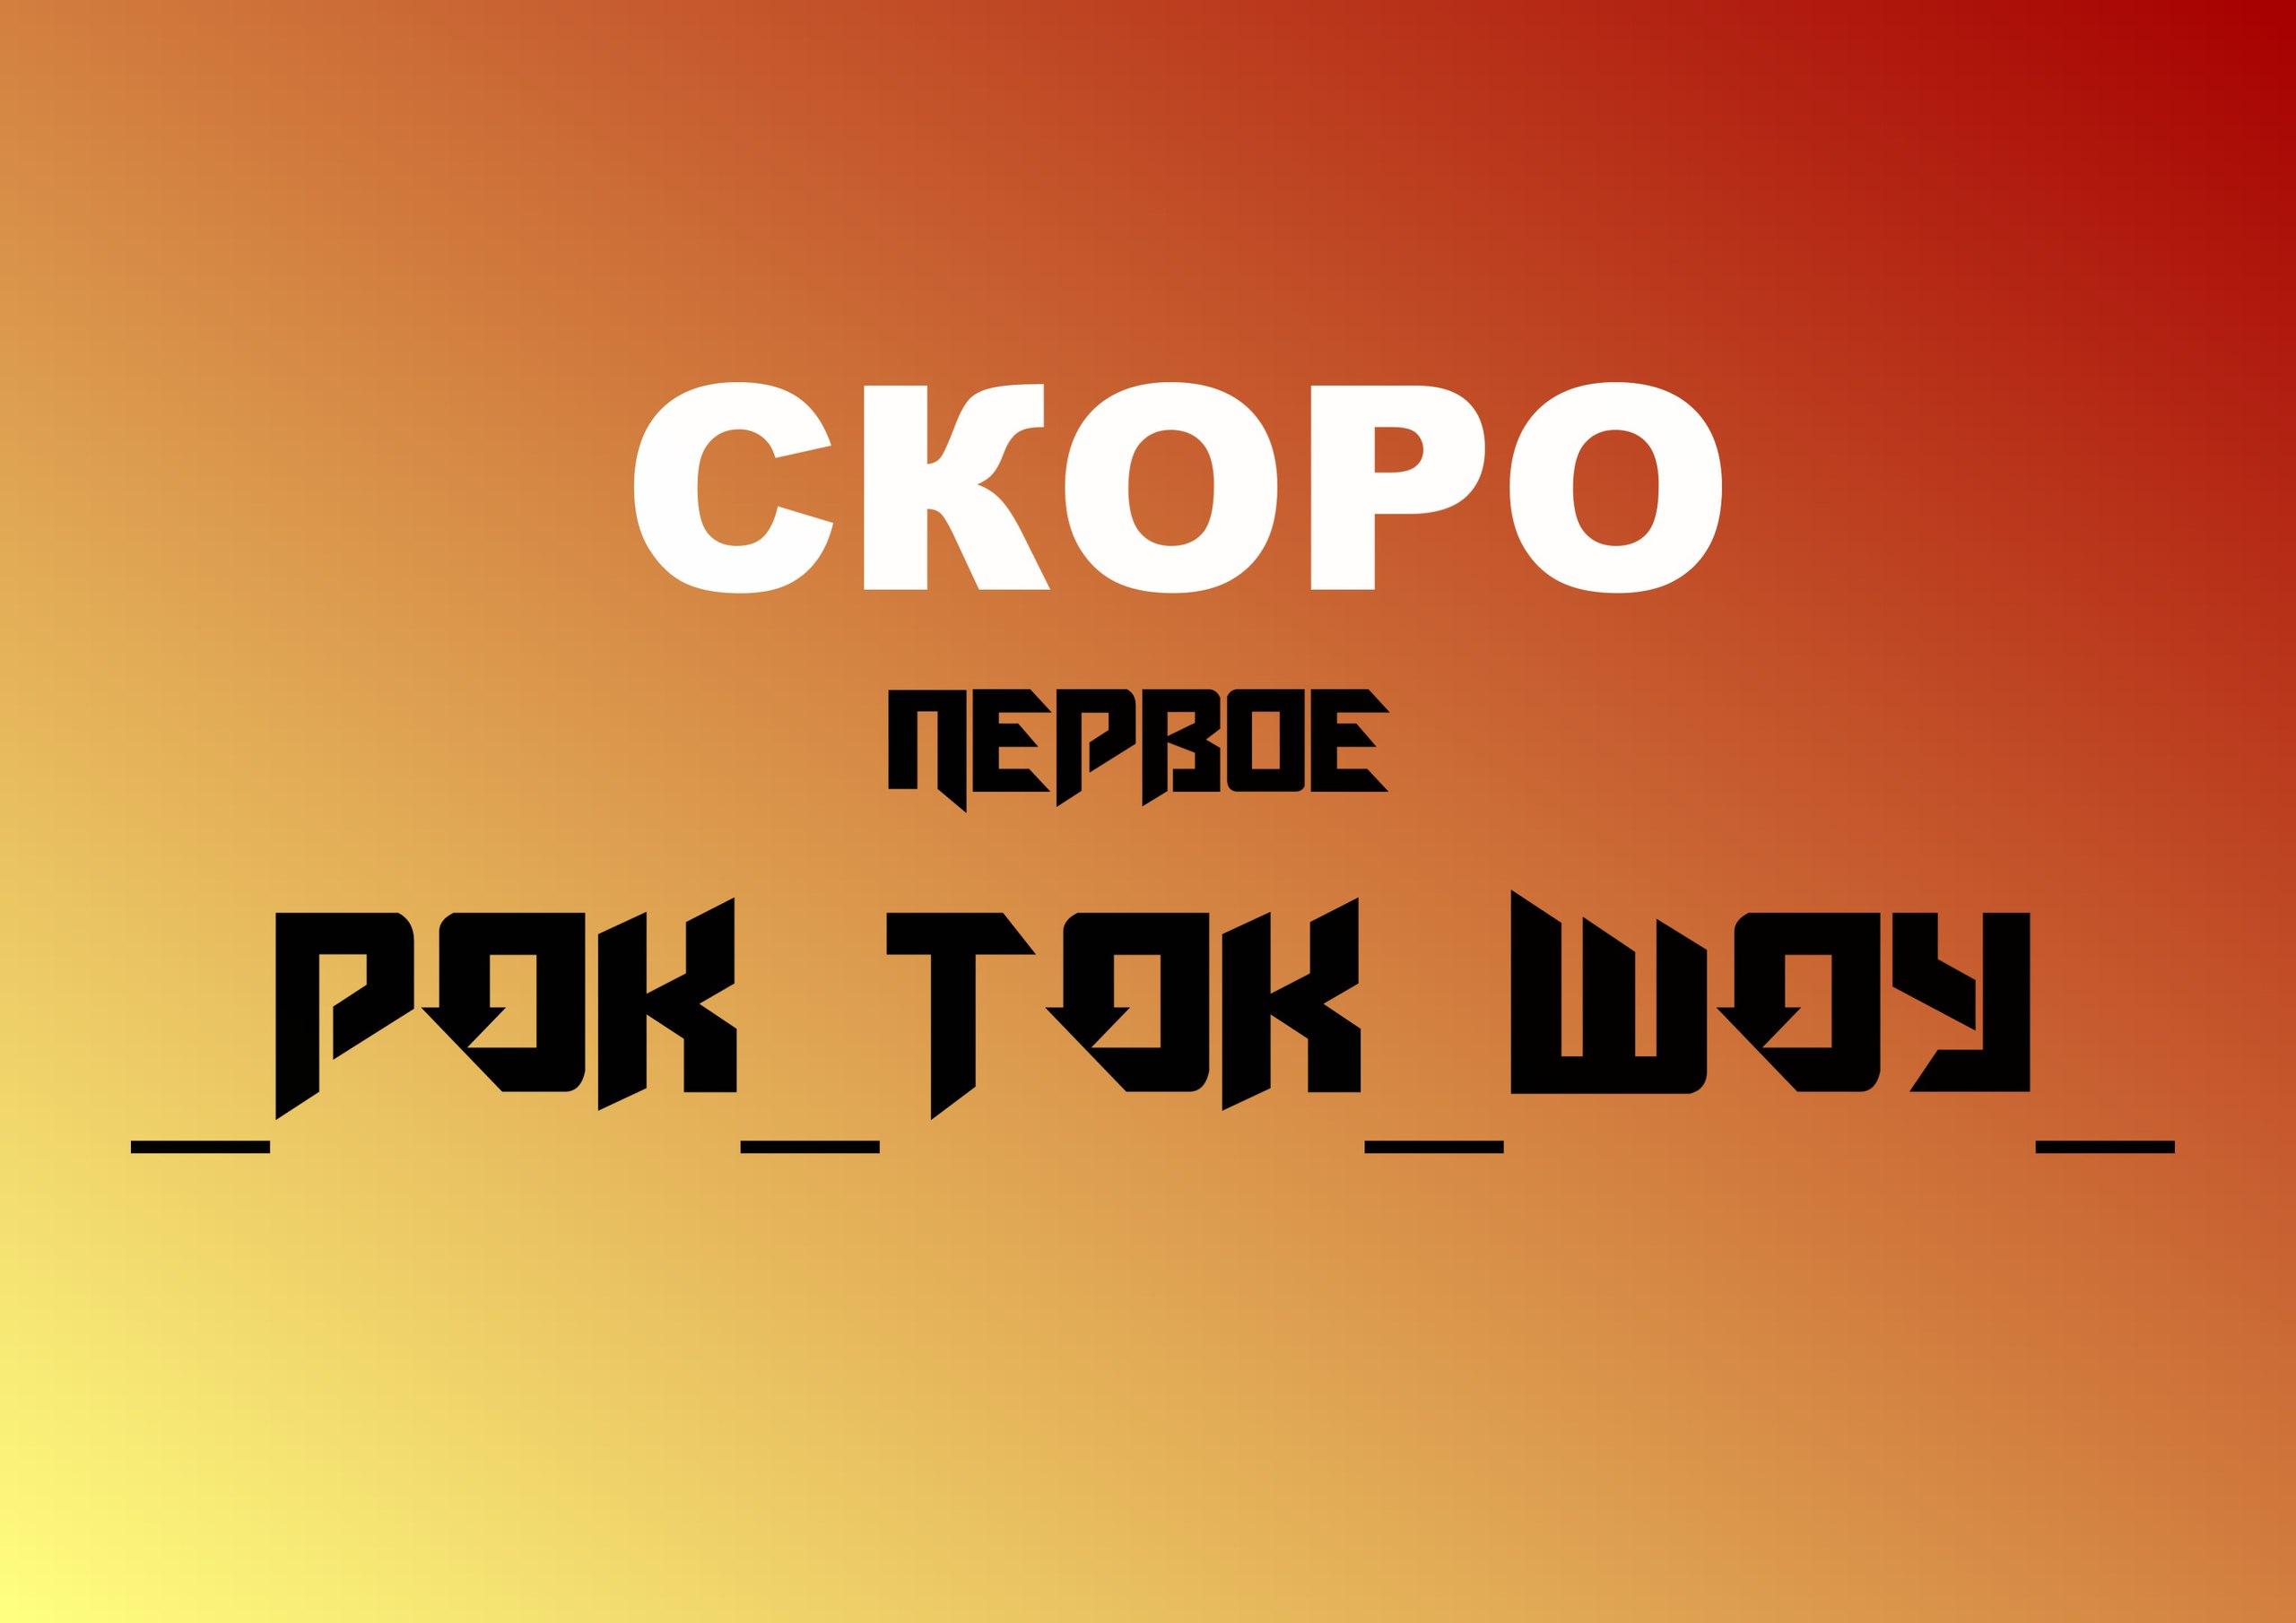 https://pp.userapi.com/c841535/v841535832/1d7a5/Xh-ODLqTmec.jpg